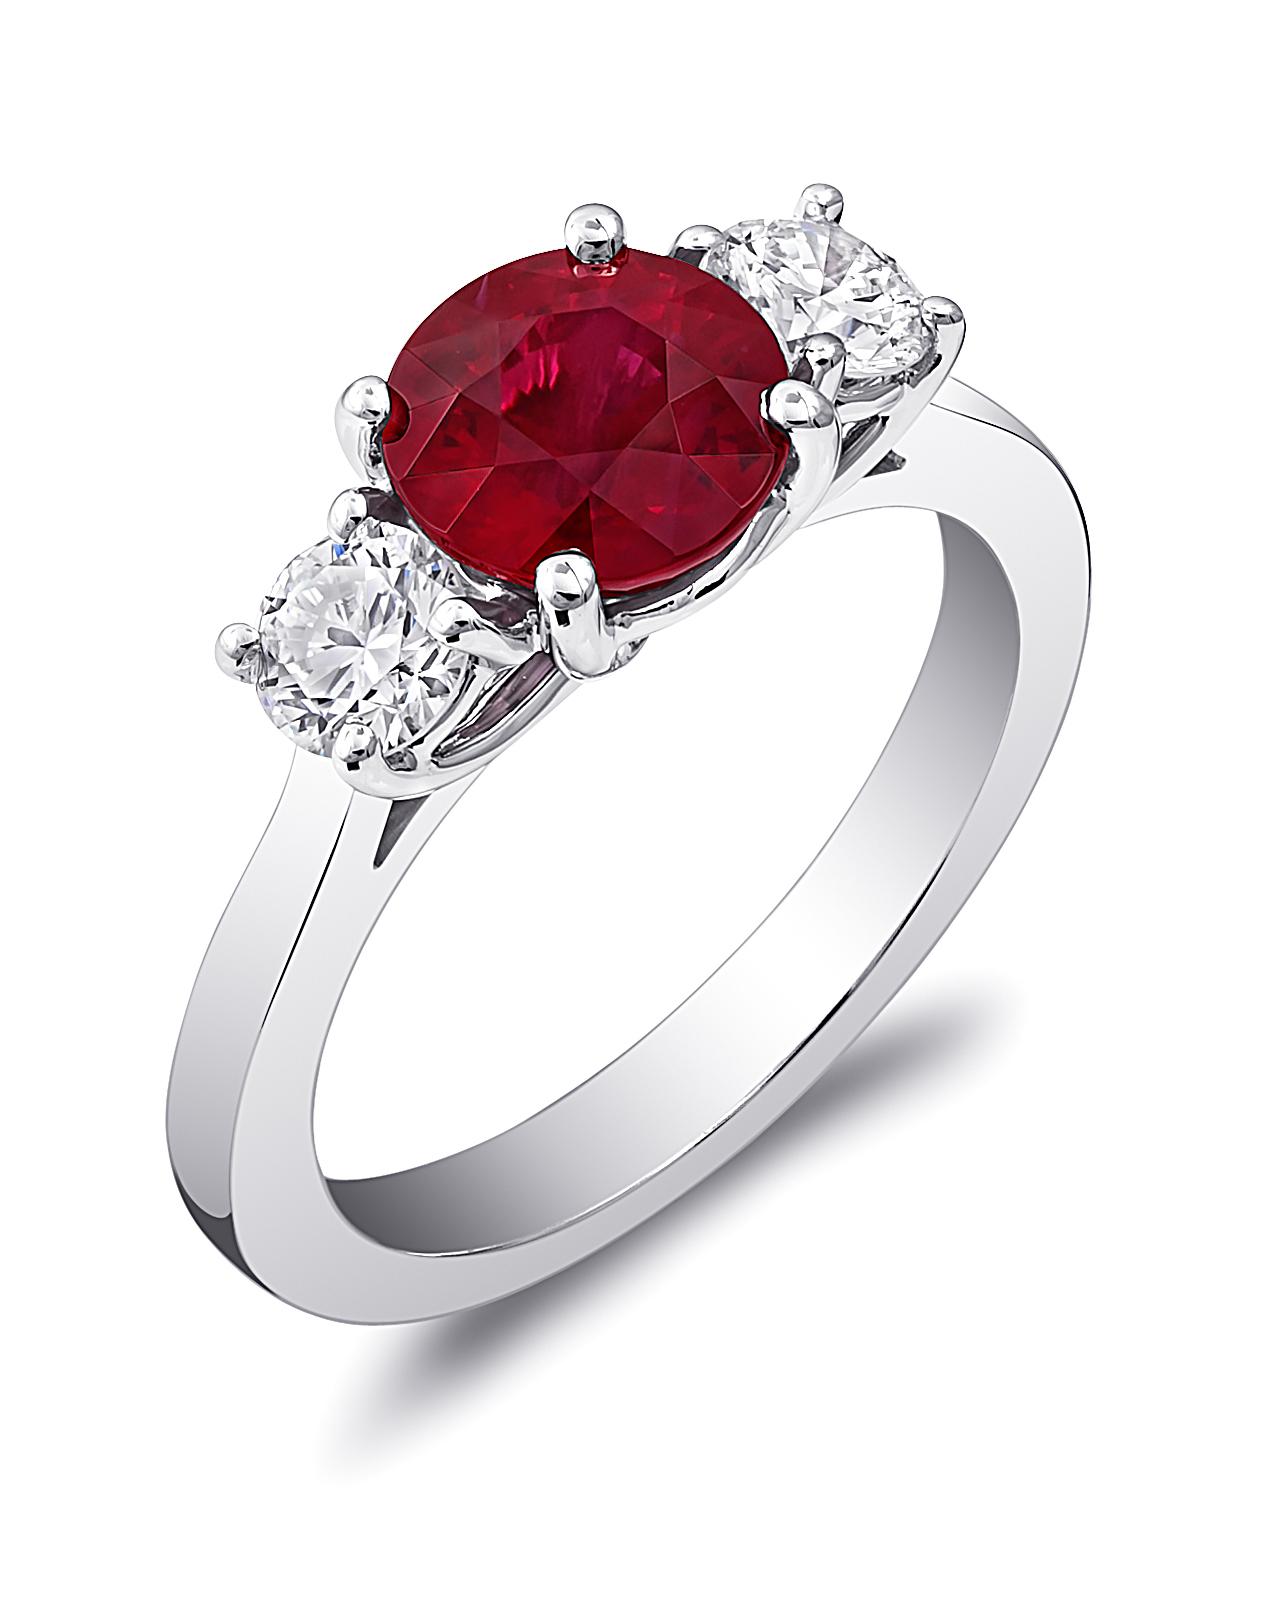 coast-diamond-ruby-and-diamond-engagement-ring-0816.jpg